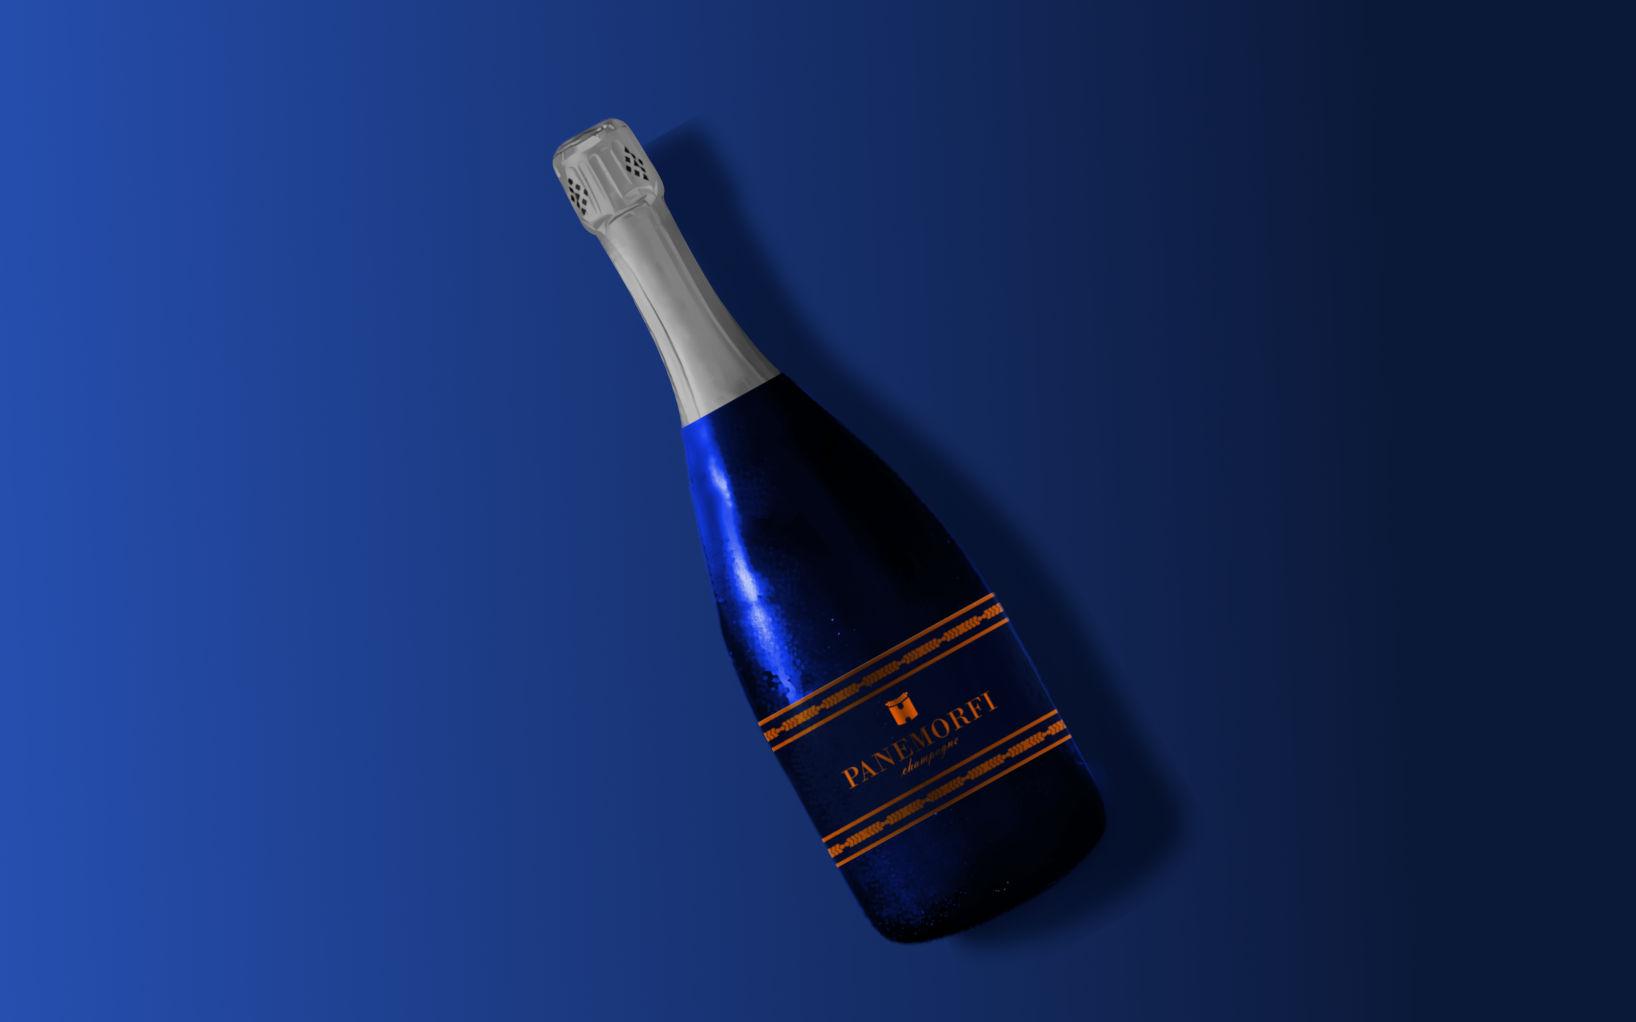 wine bottle on blue background